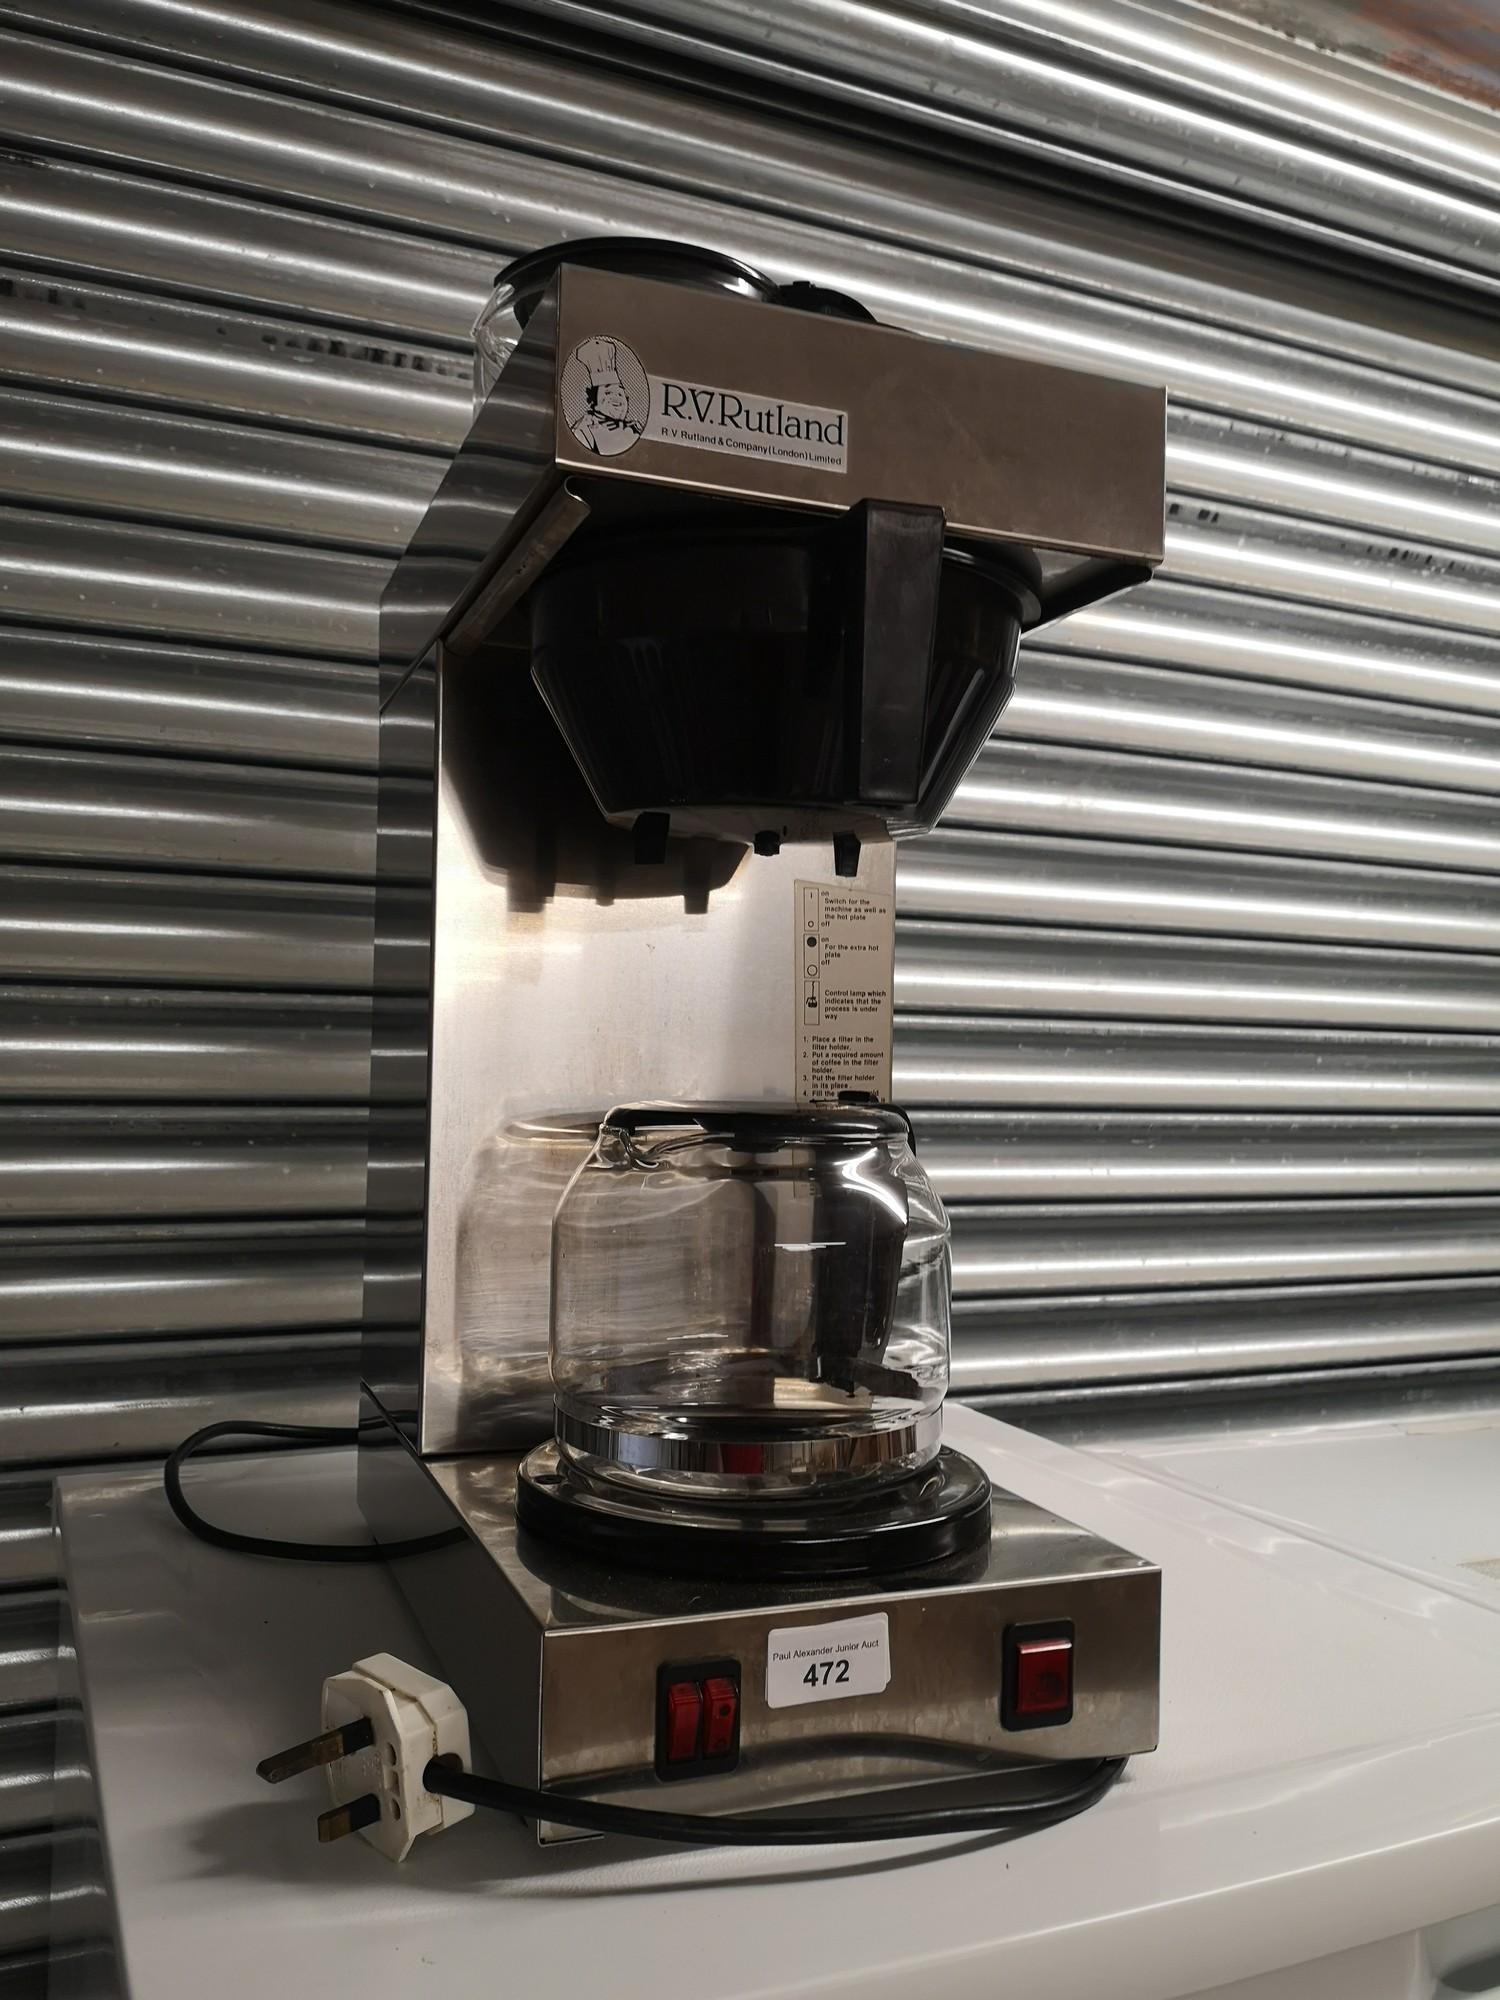 Rutland coffee machine. Working order. - Image 2 of 2